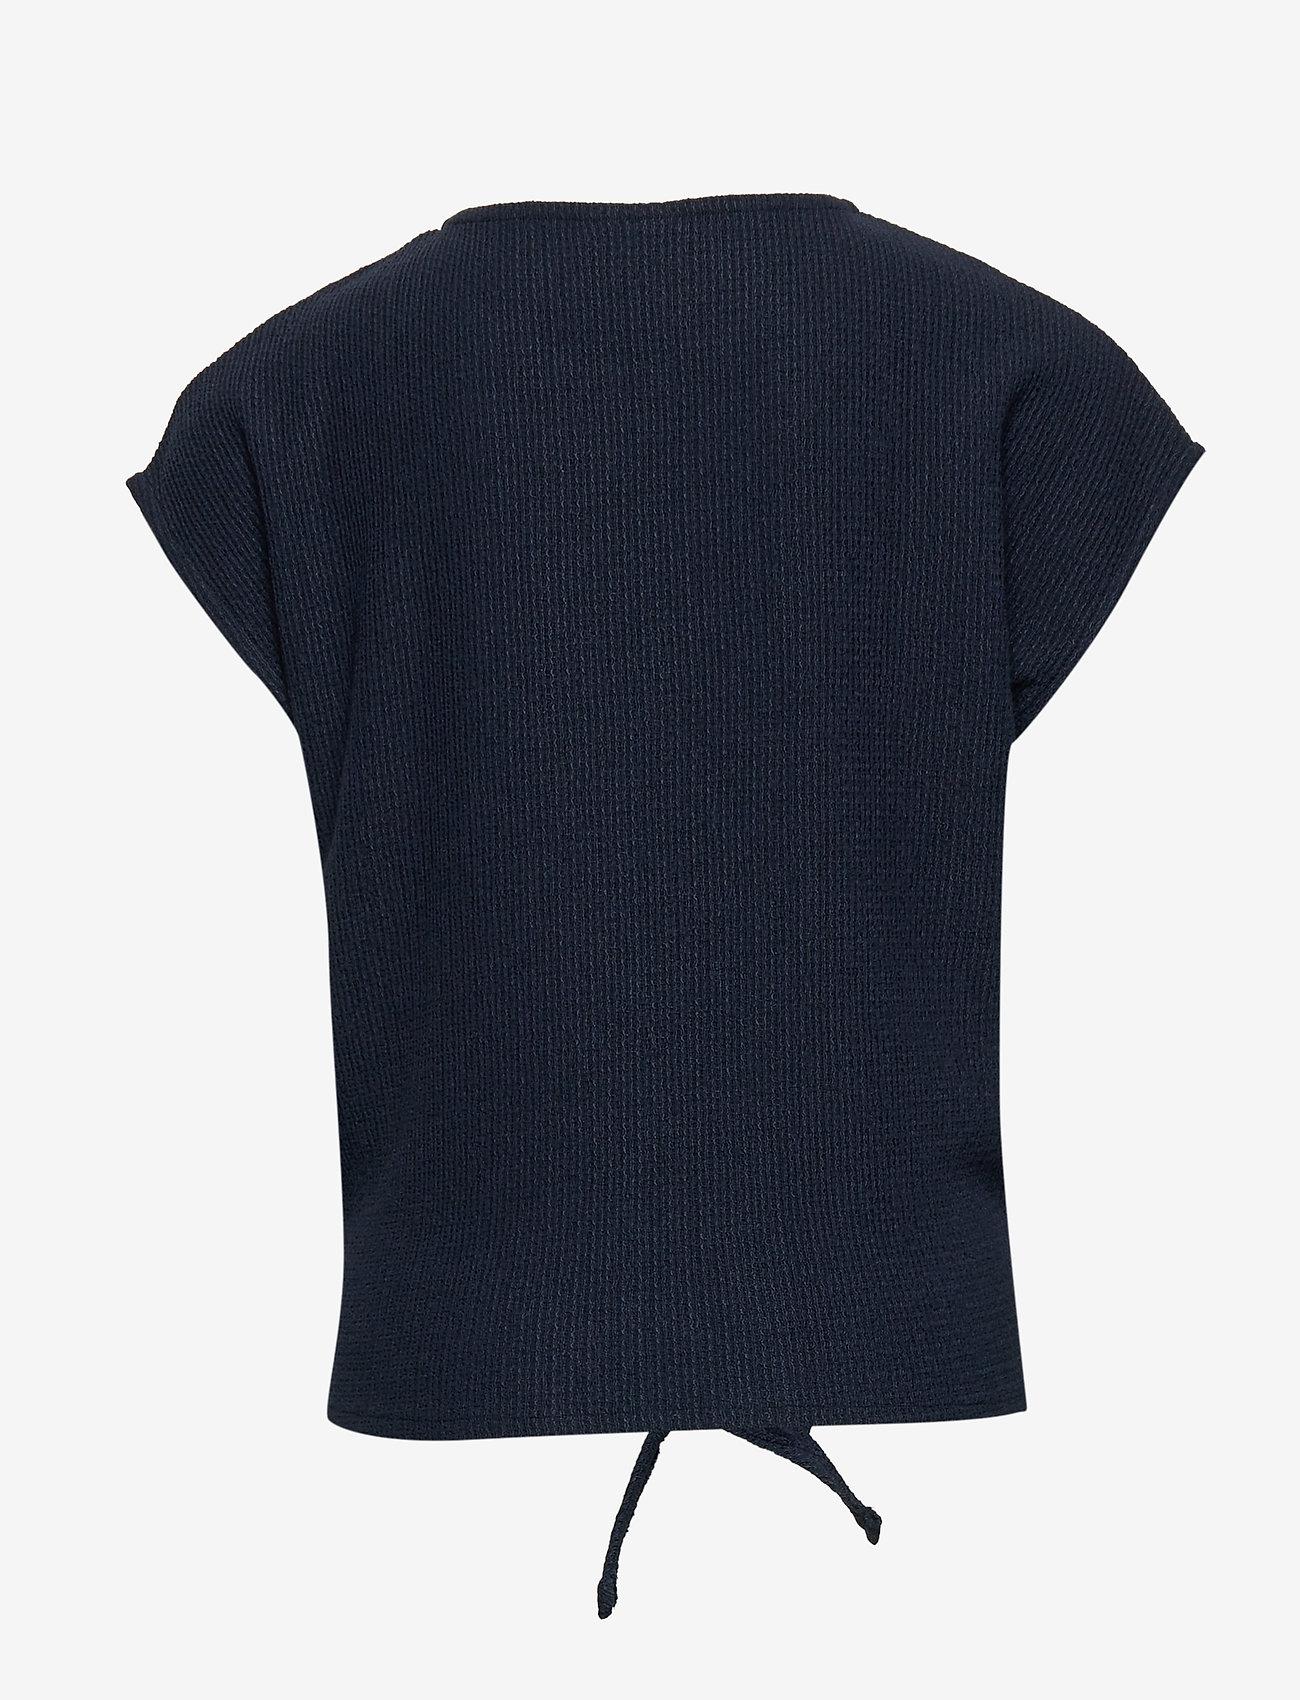 Pam S_s Top (Navy Blazer) (22.72 €) - The New JZuCg